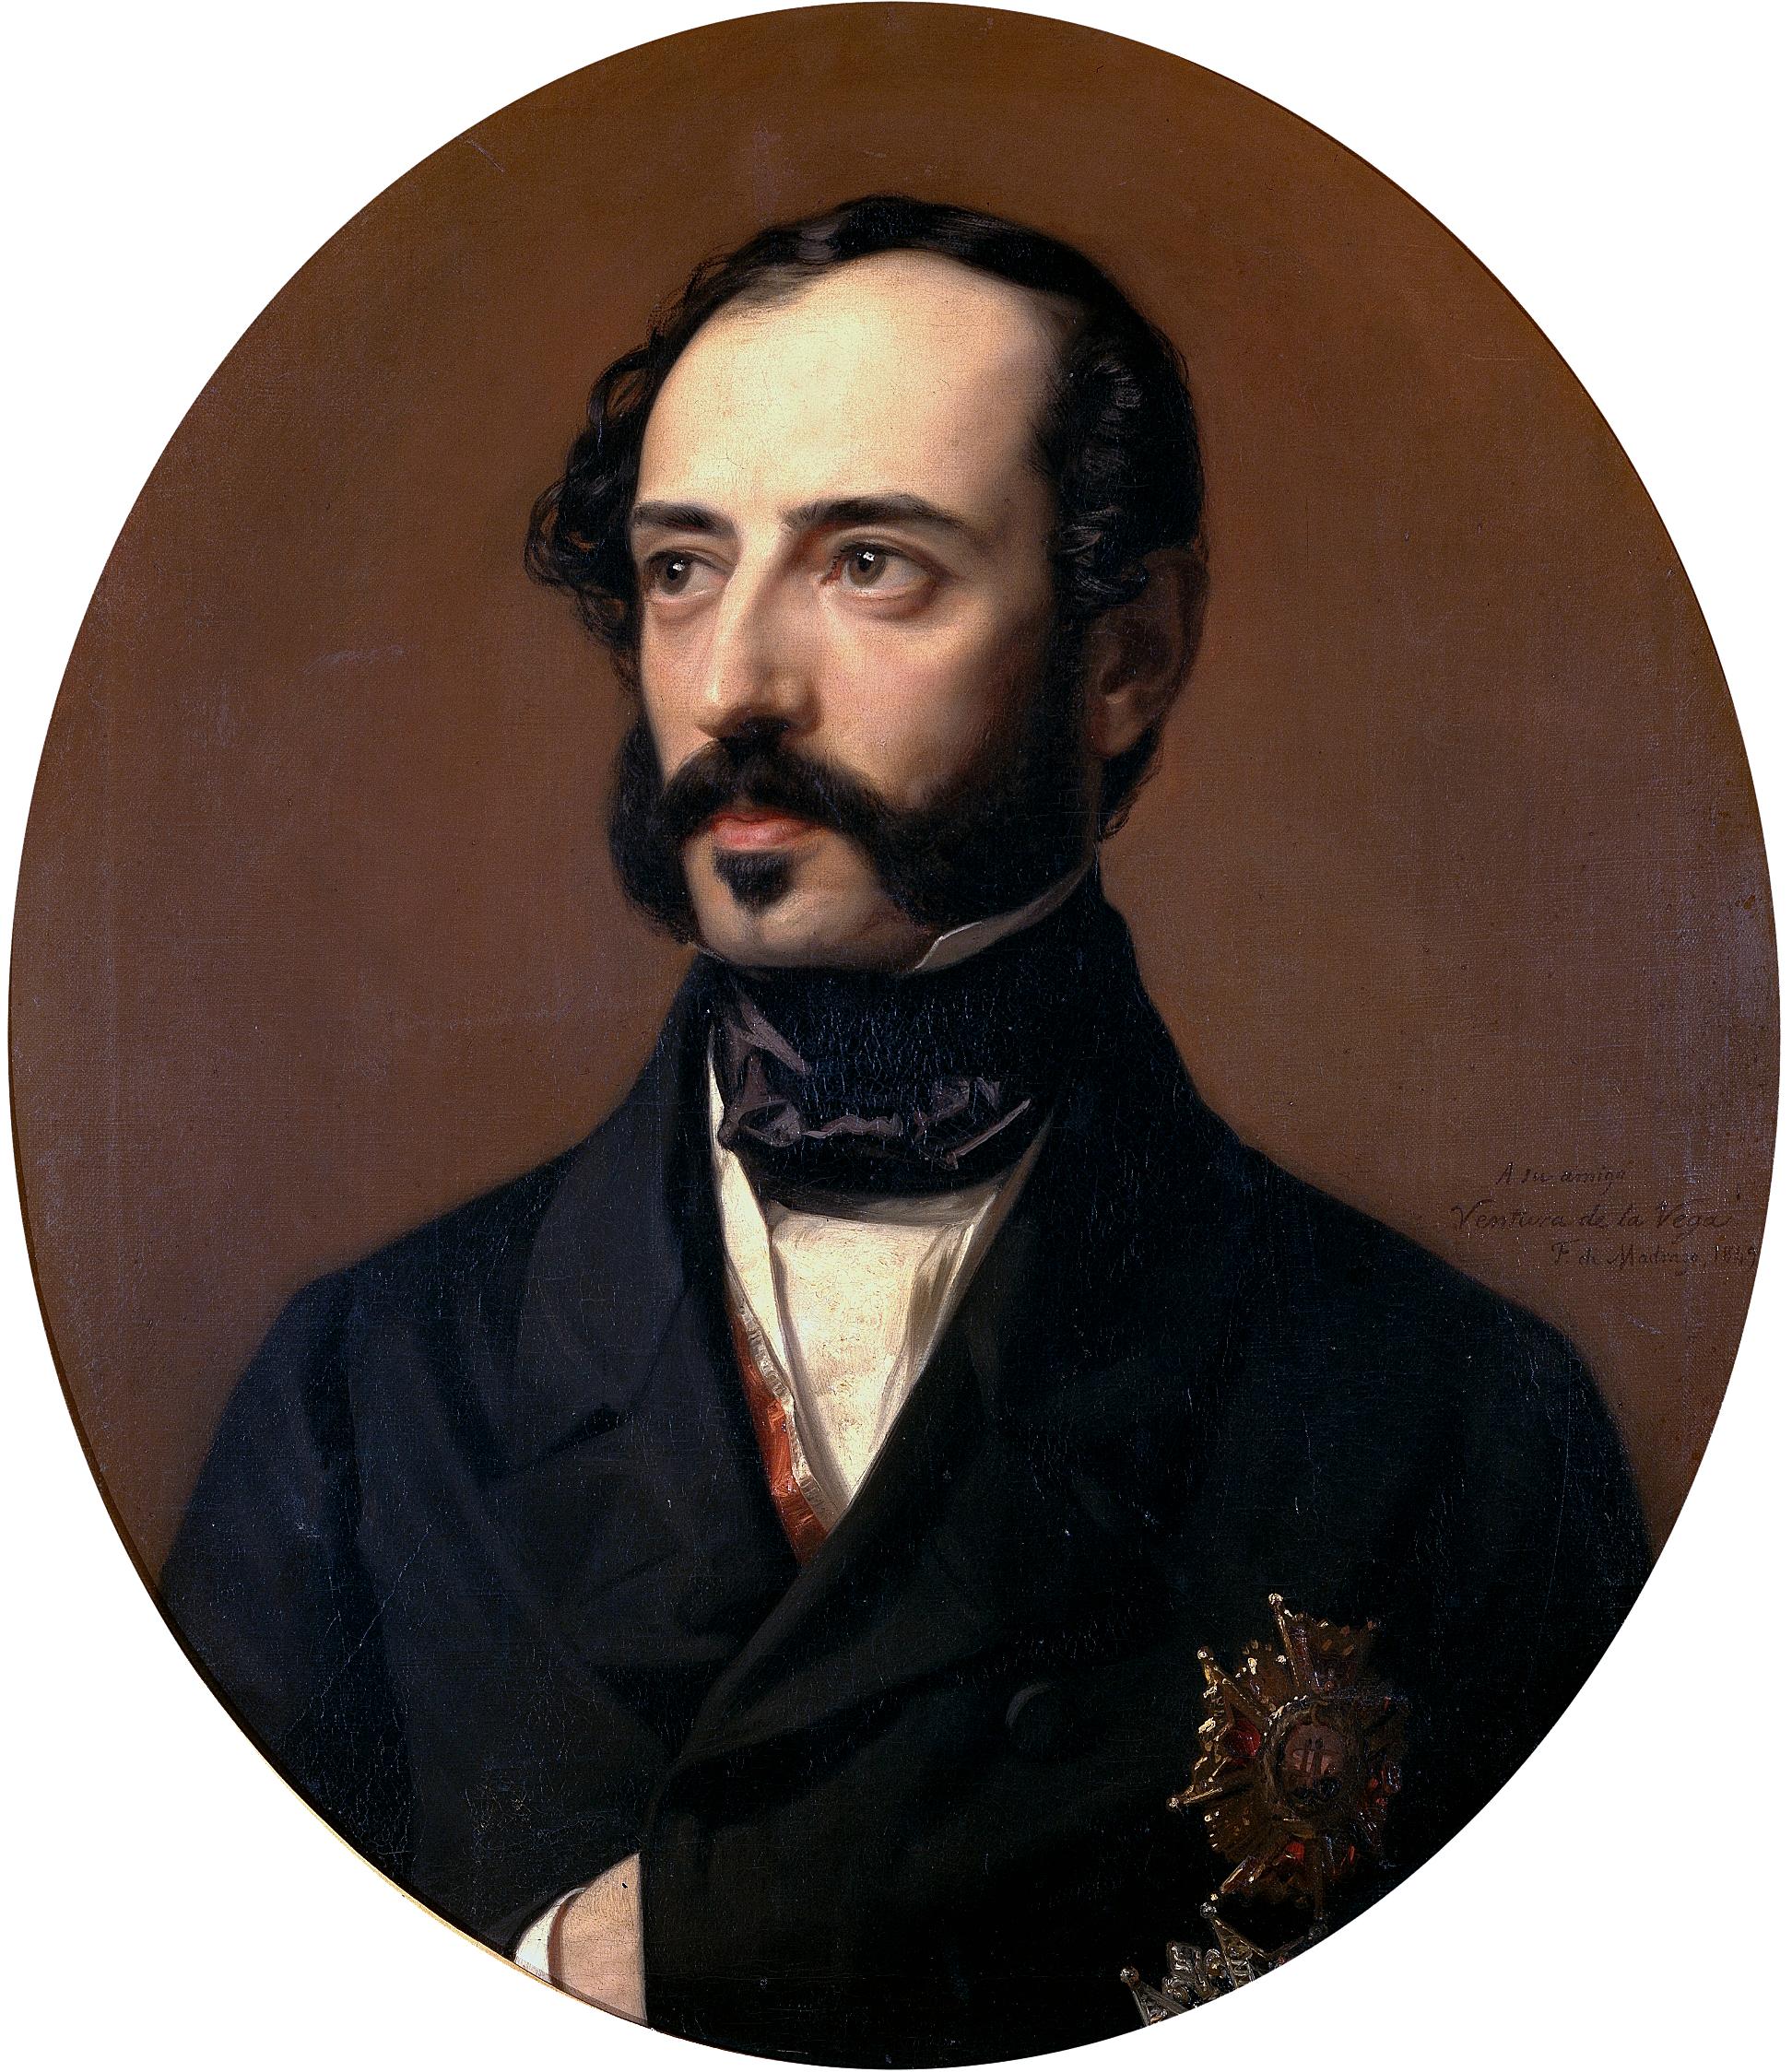 Depiction of Ventura de la Vega